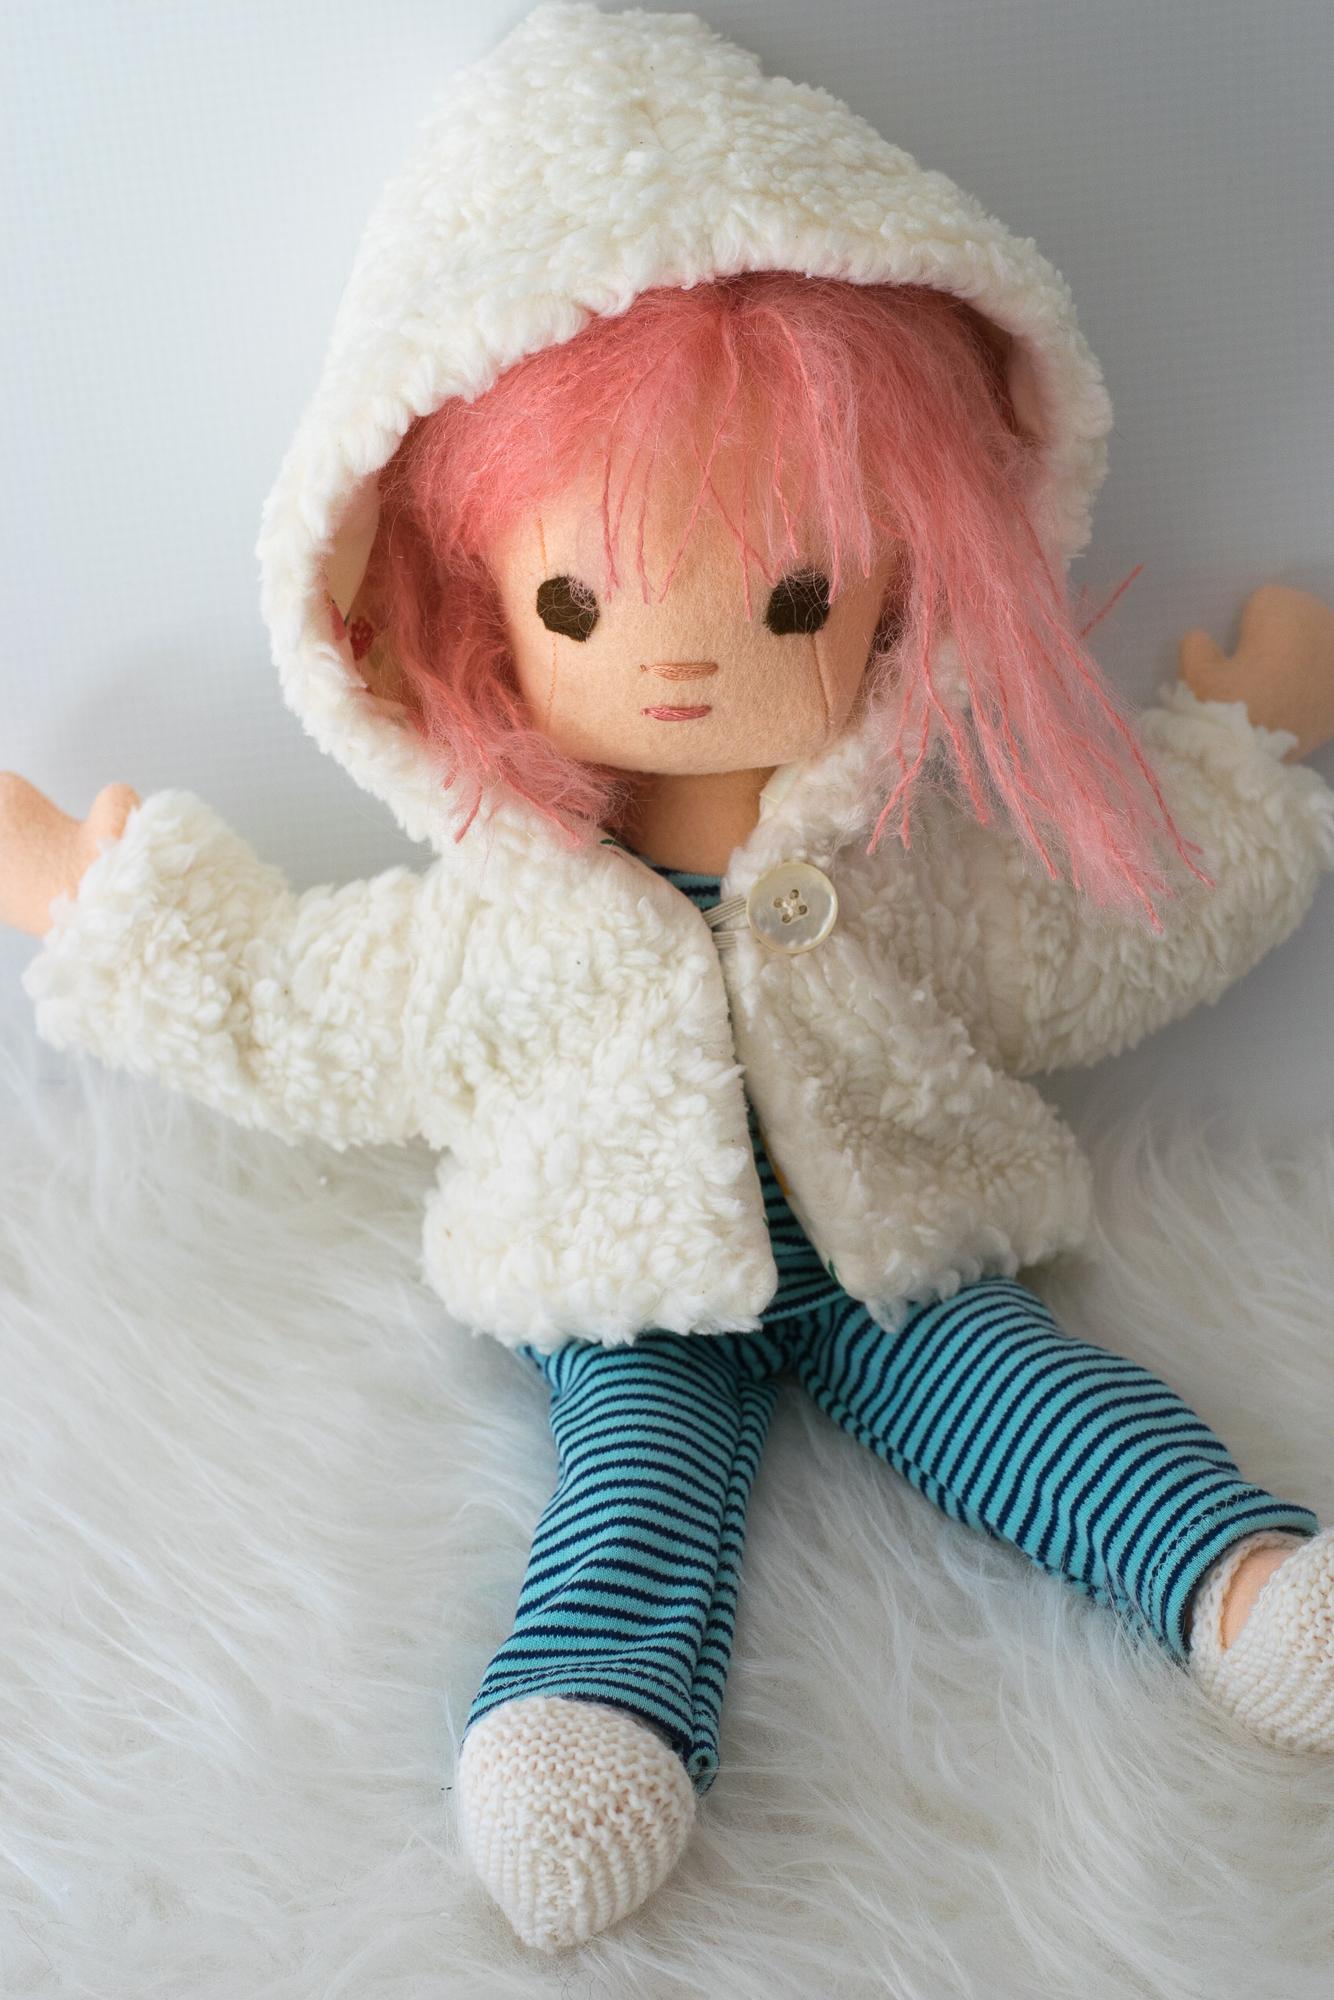 Gallery of Dolls-15.jpg